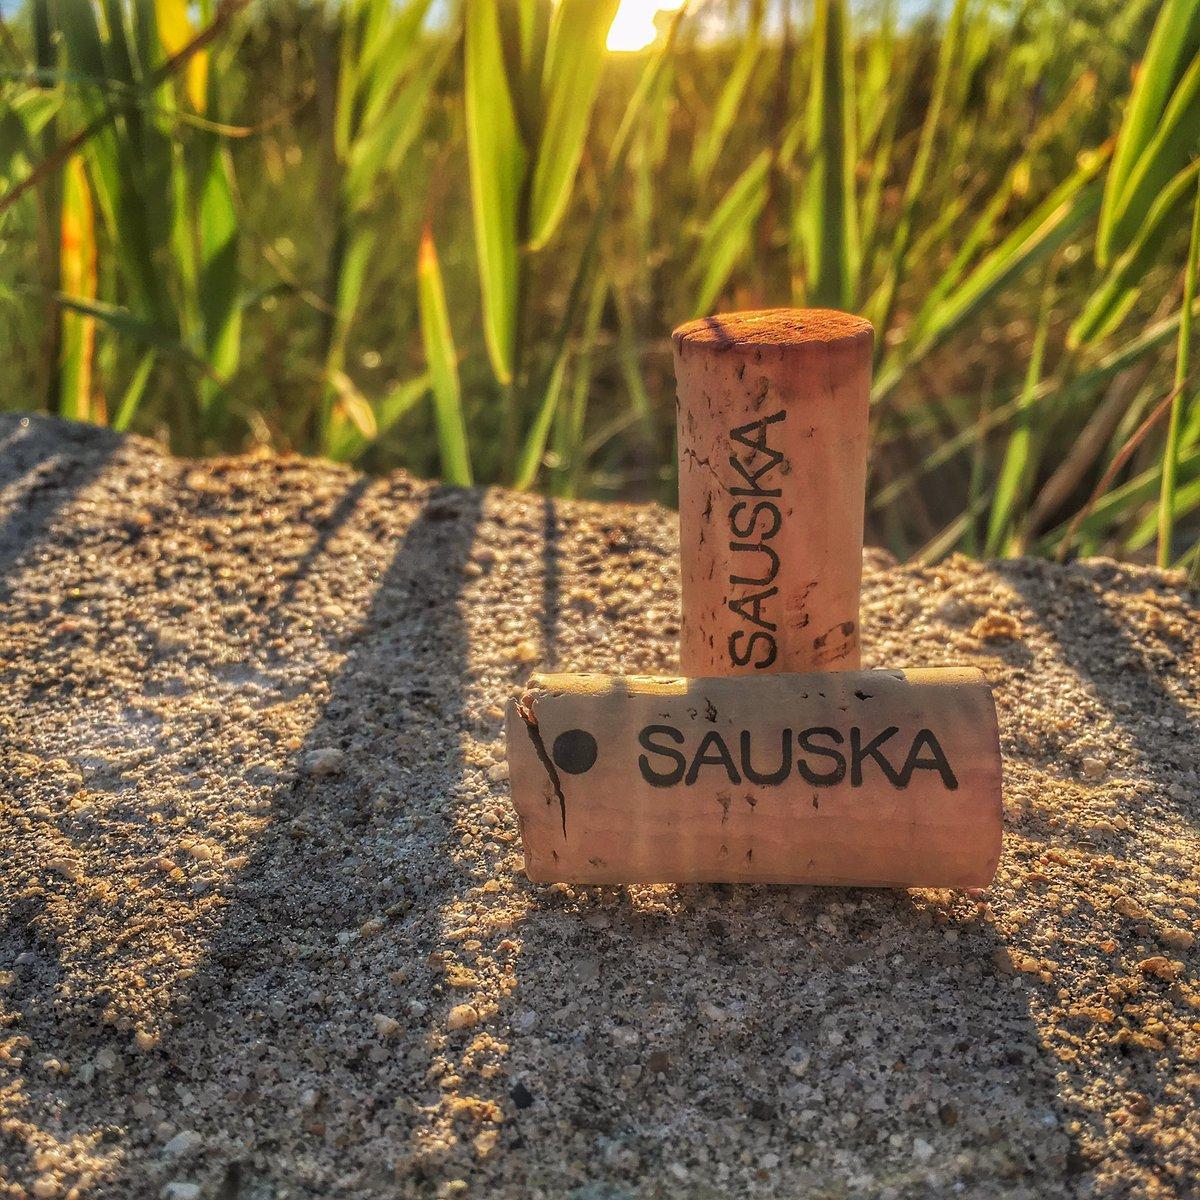 Put a cork in it  #wine <br>http://pic.twitter.com/jrq1mC5eYr